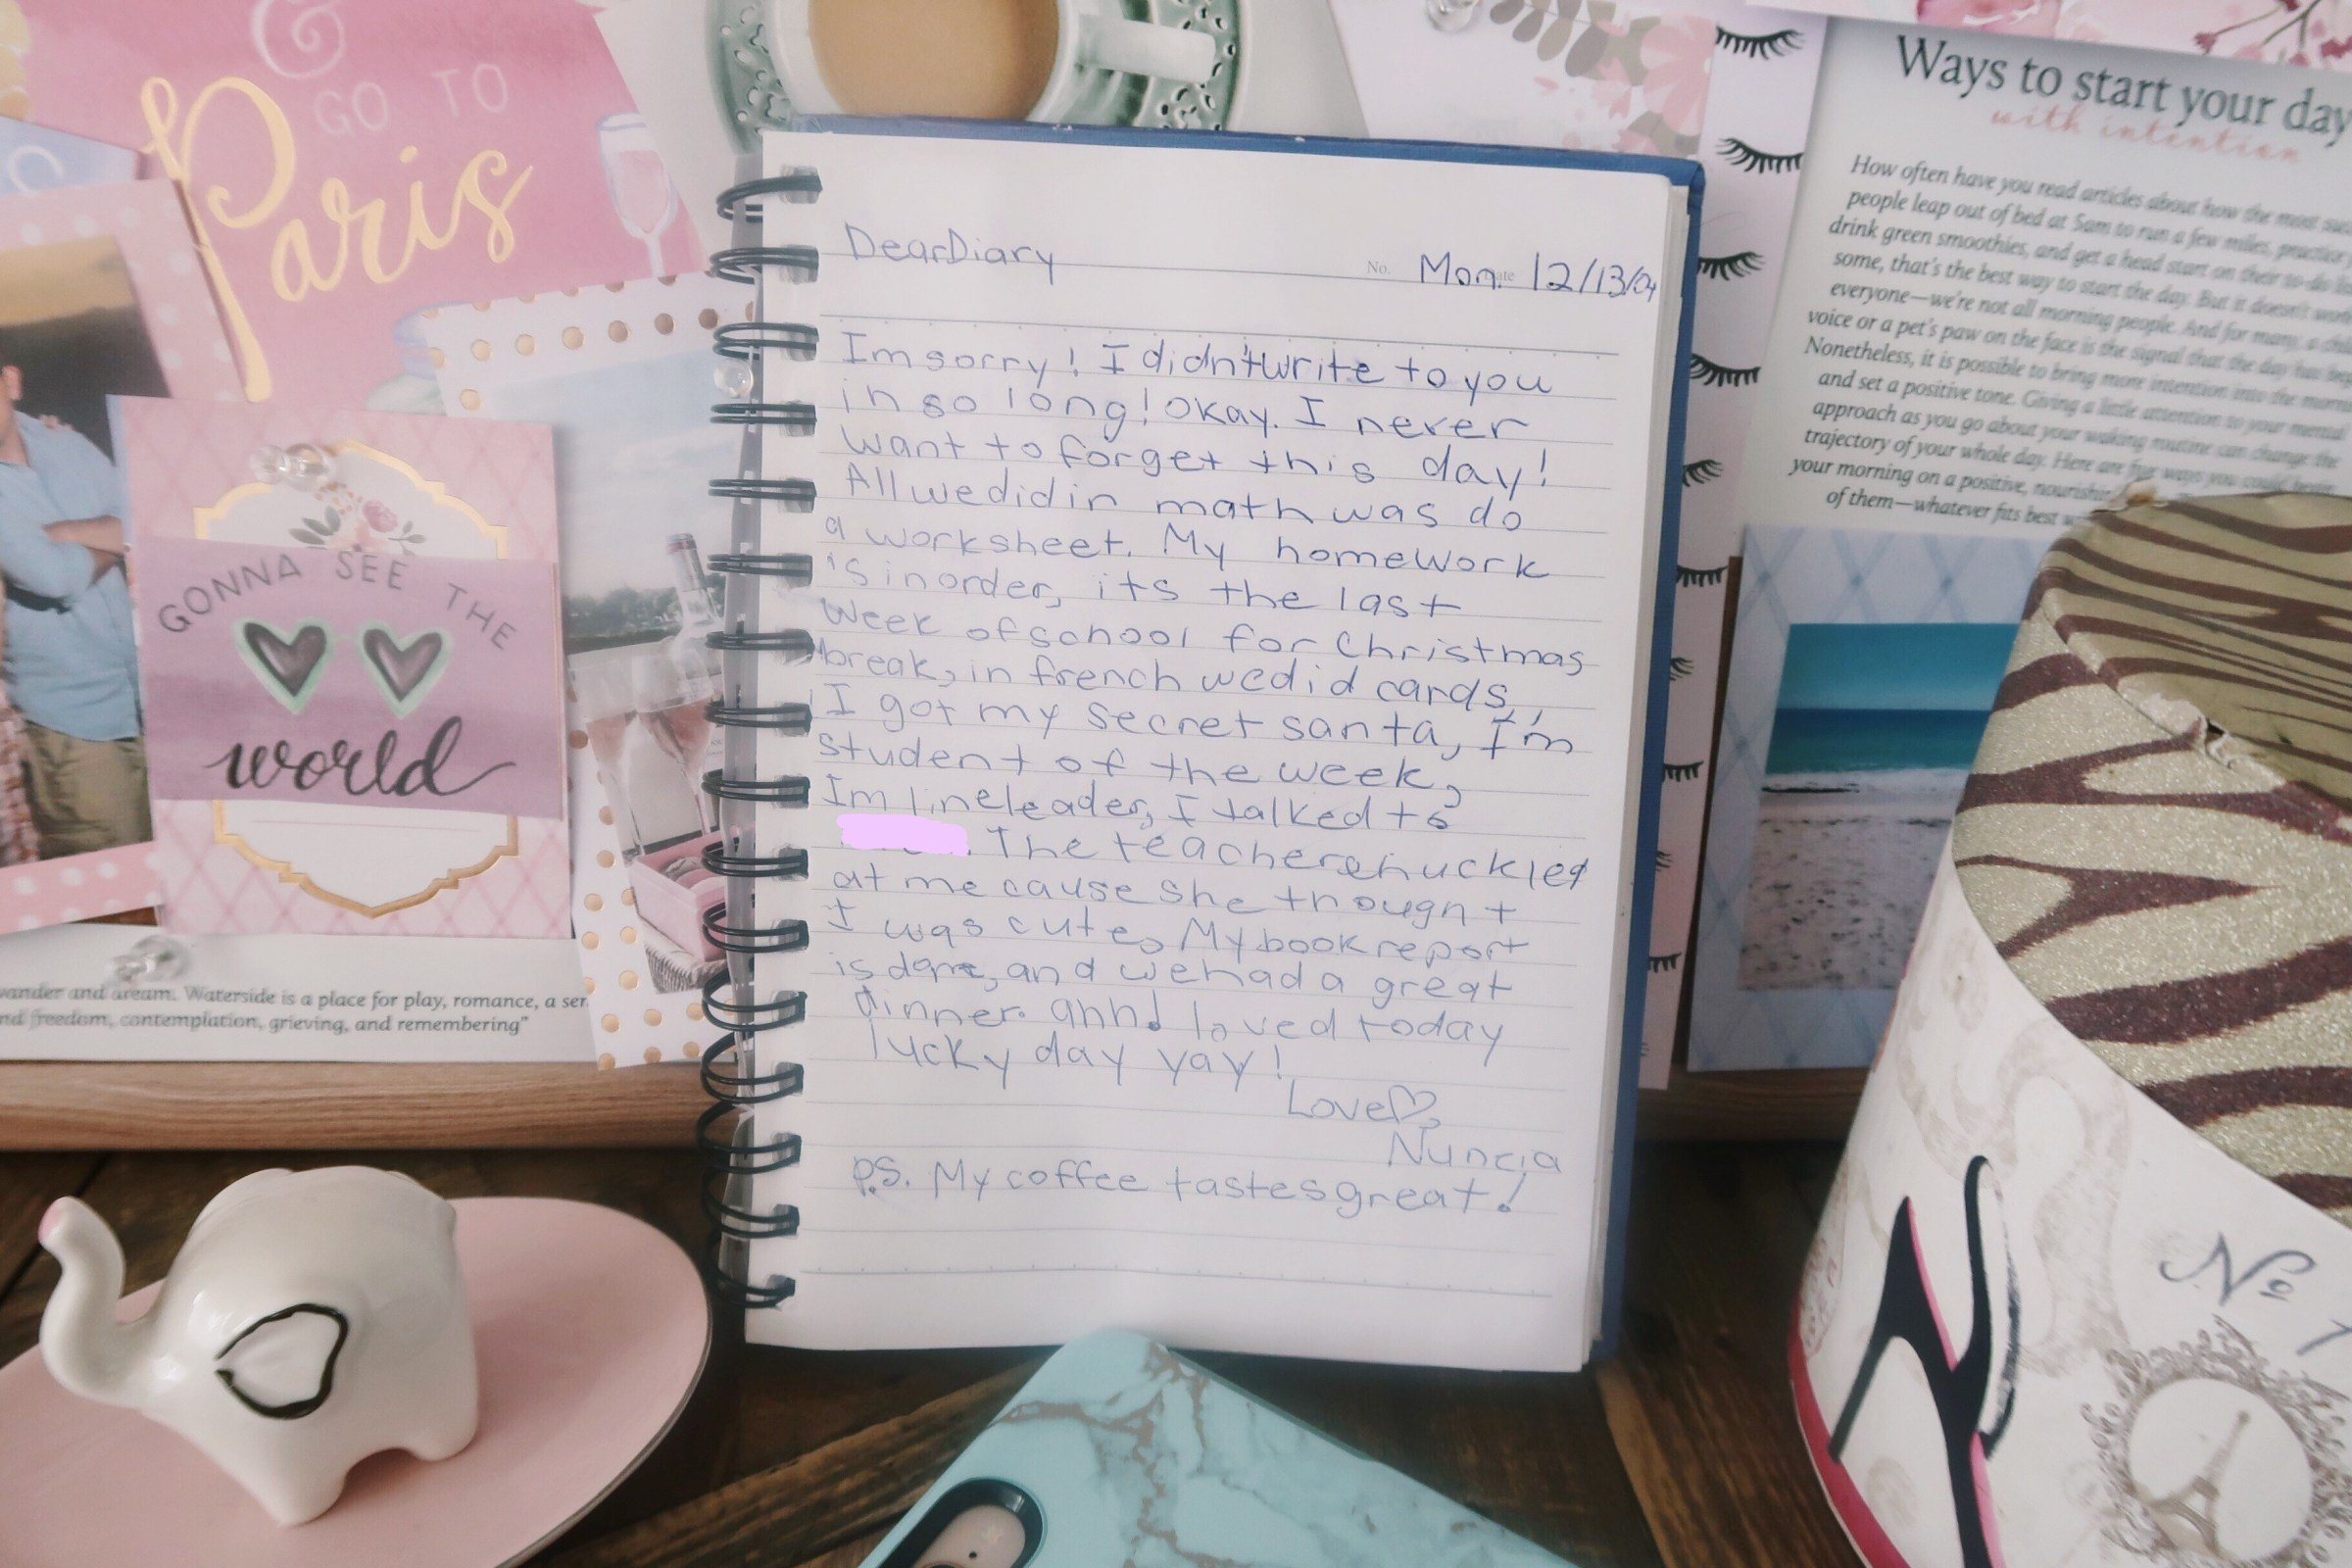 12/13/2004 Diary Entries